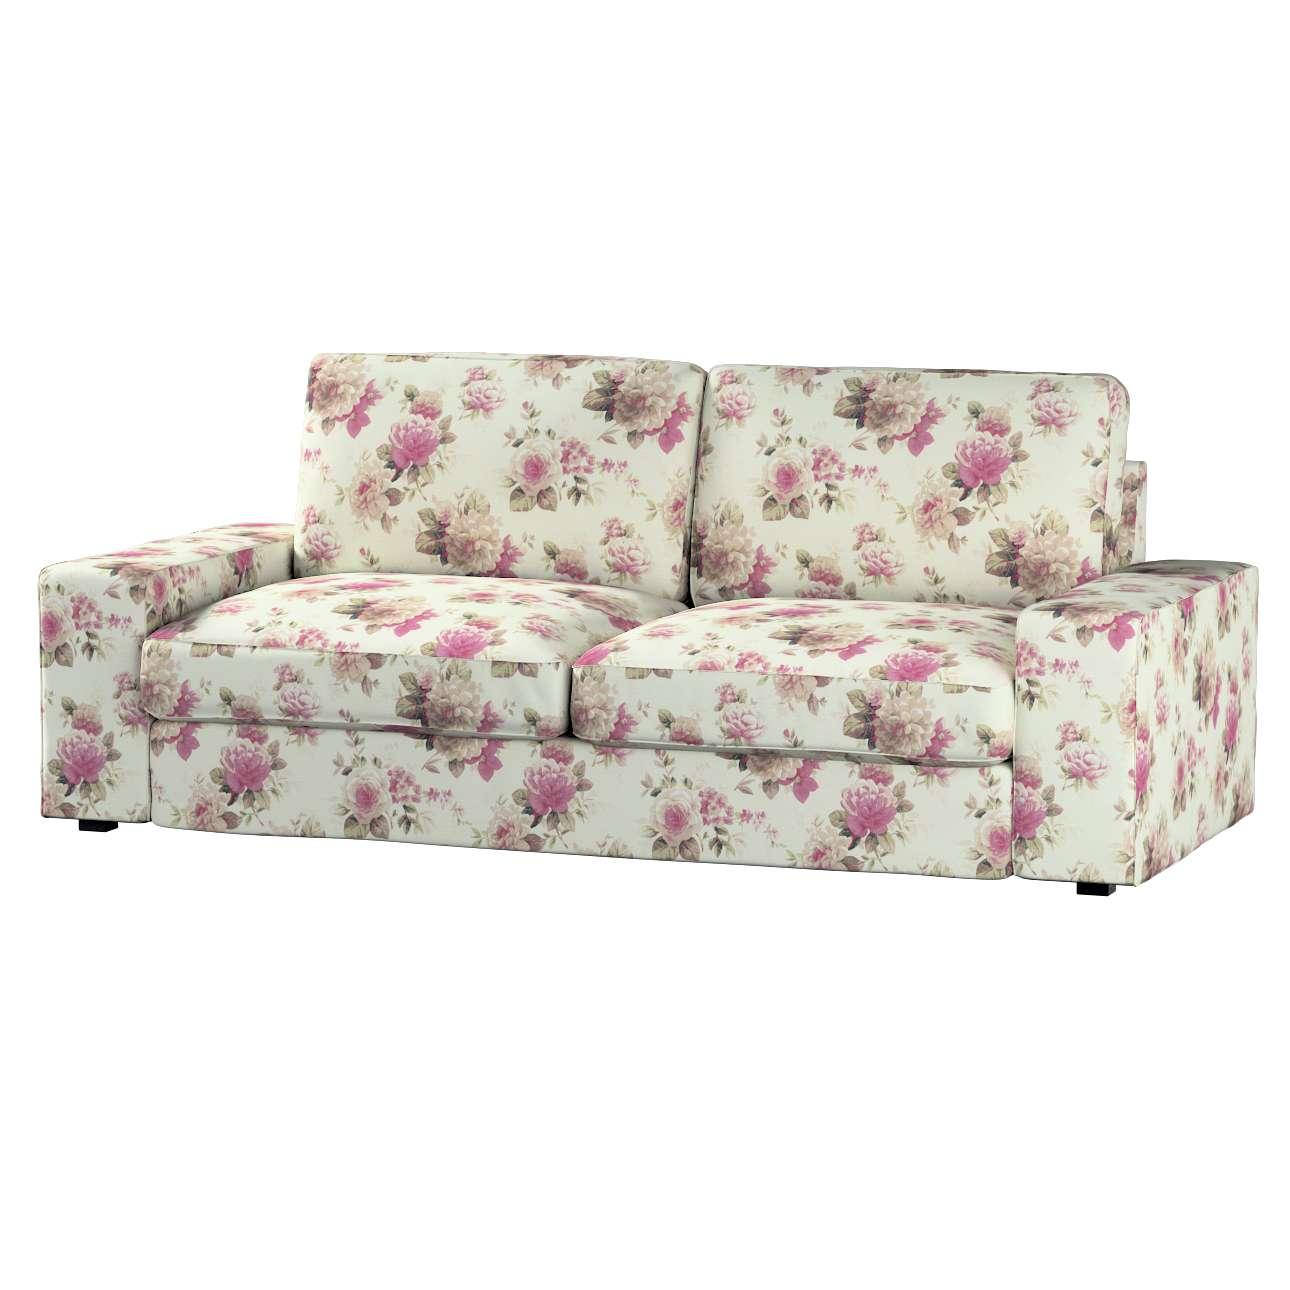 Kivik 3-Sitzer Sofabezug, beige- rosa, Sofa Kivik 3-Sitzer, Mirella